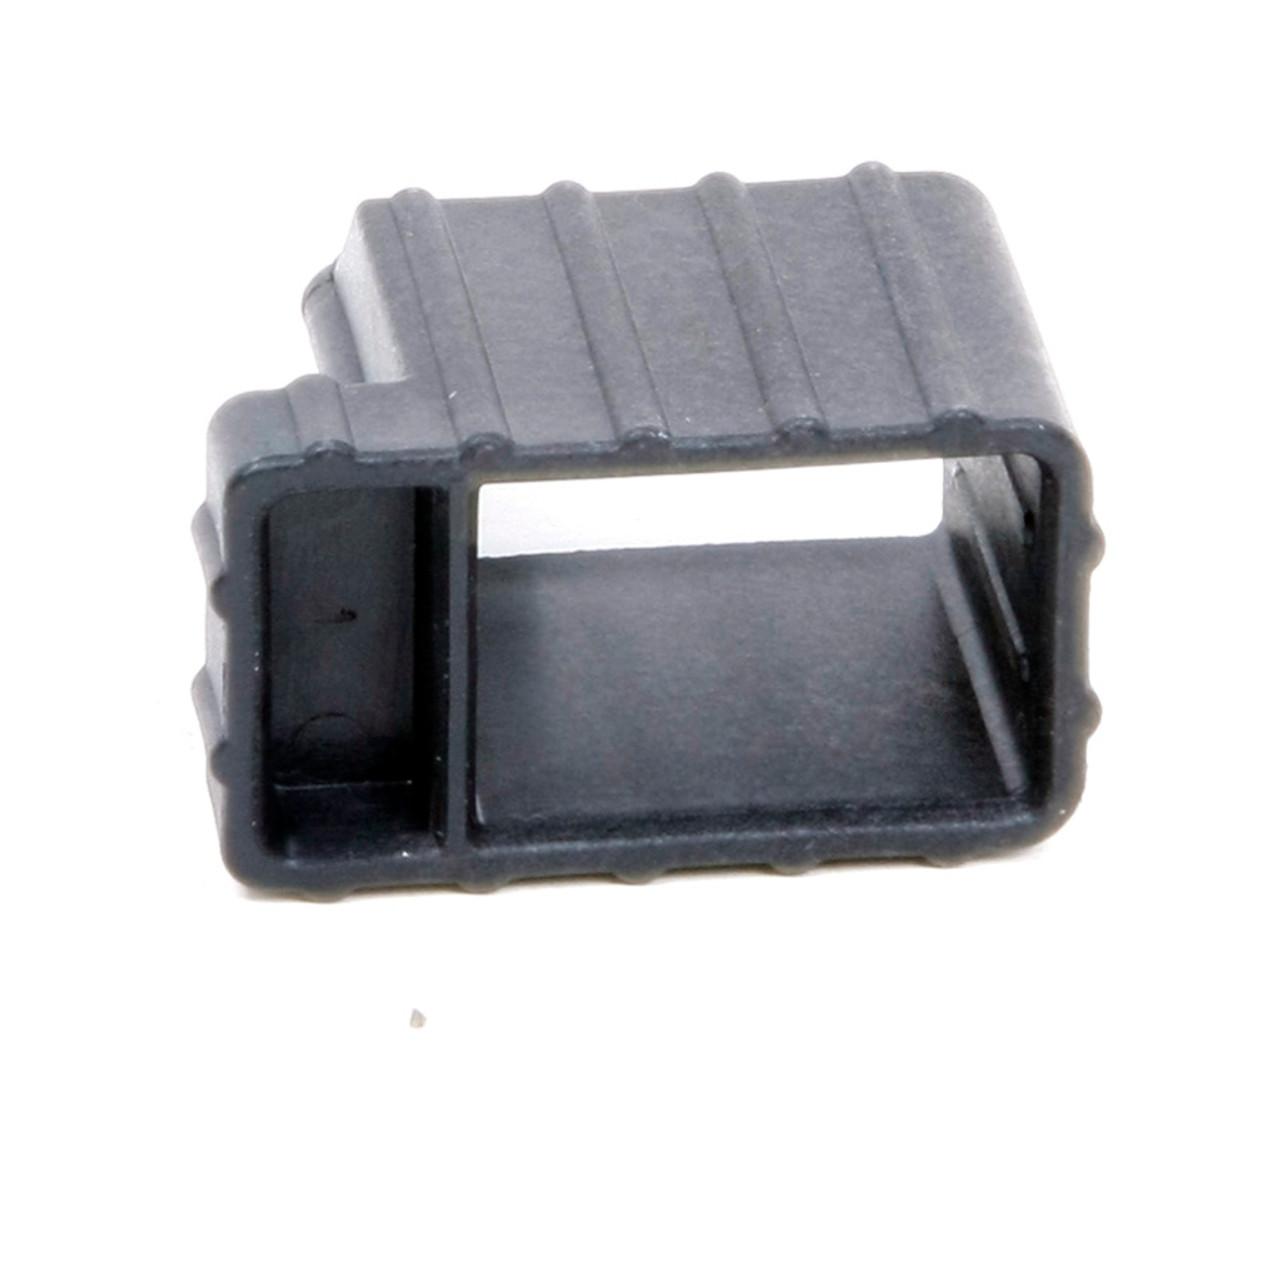 Magazine Loader for the Glock® 9mm & .40 S&W - Black Polymer